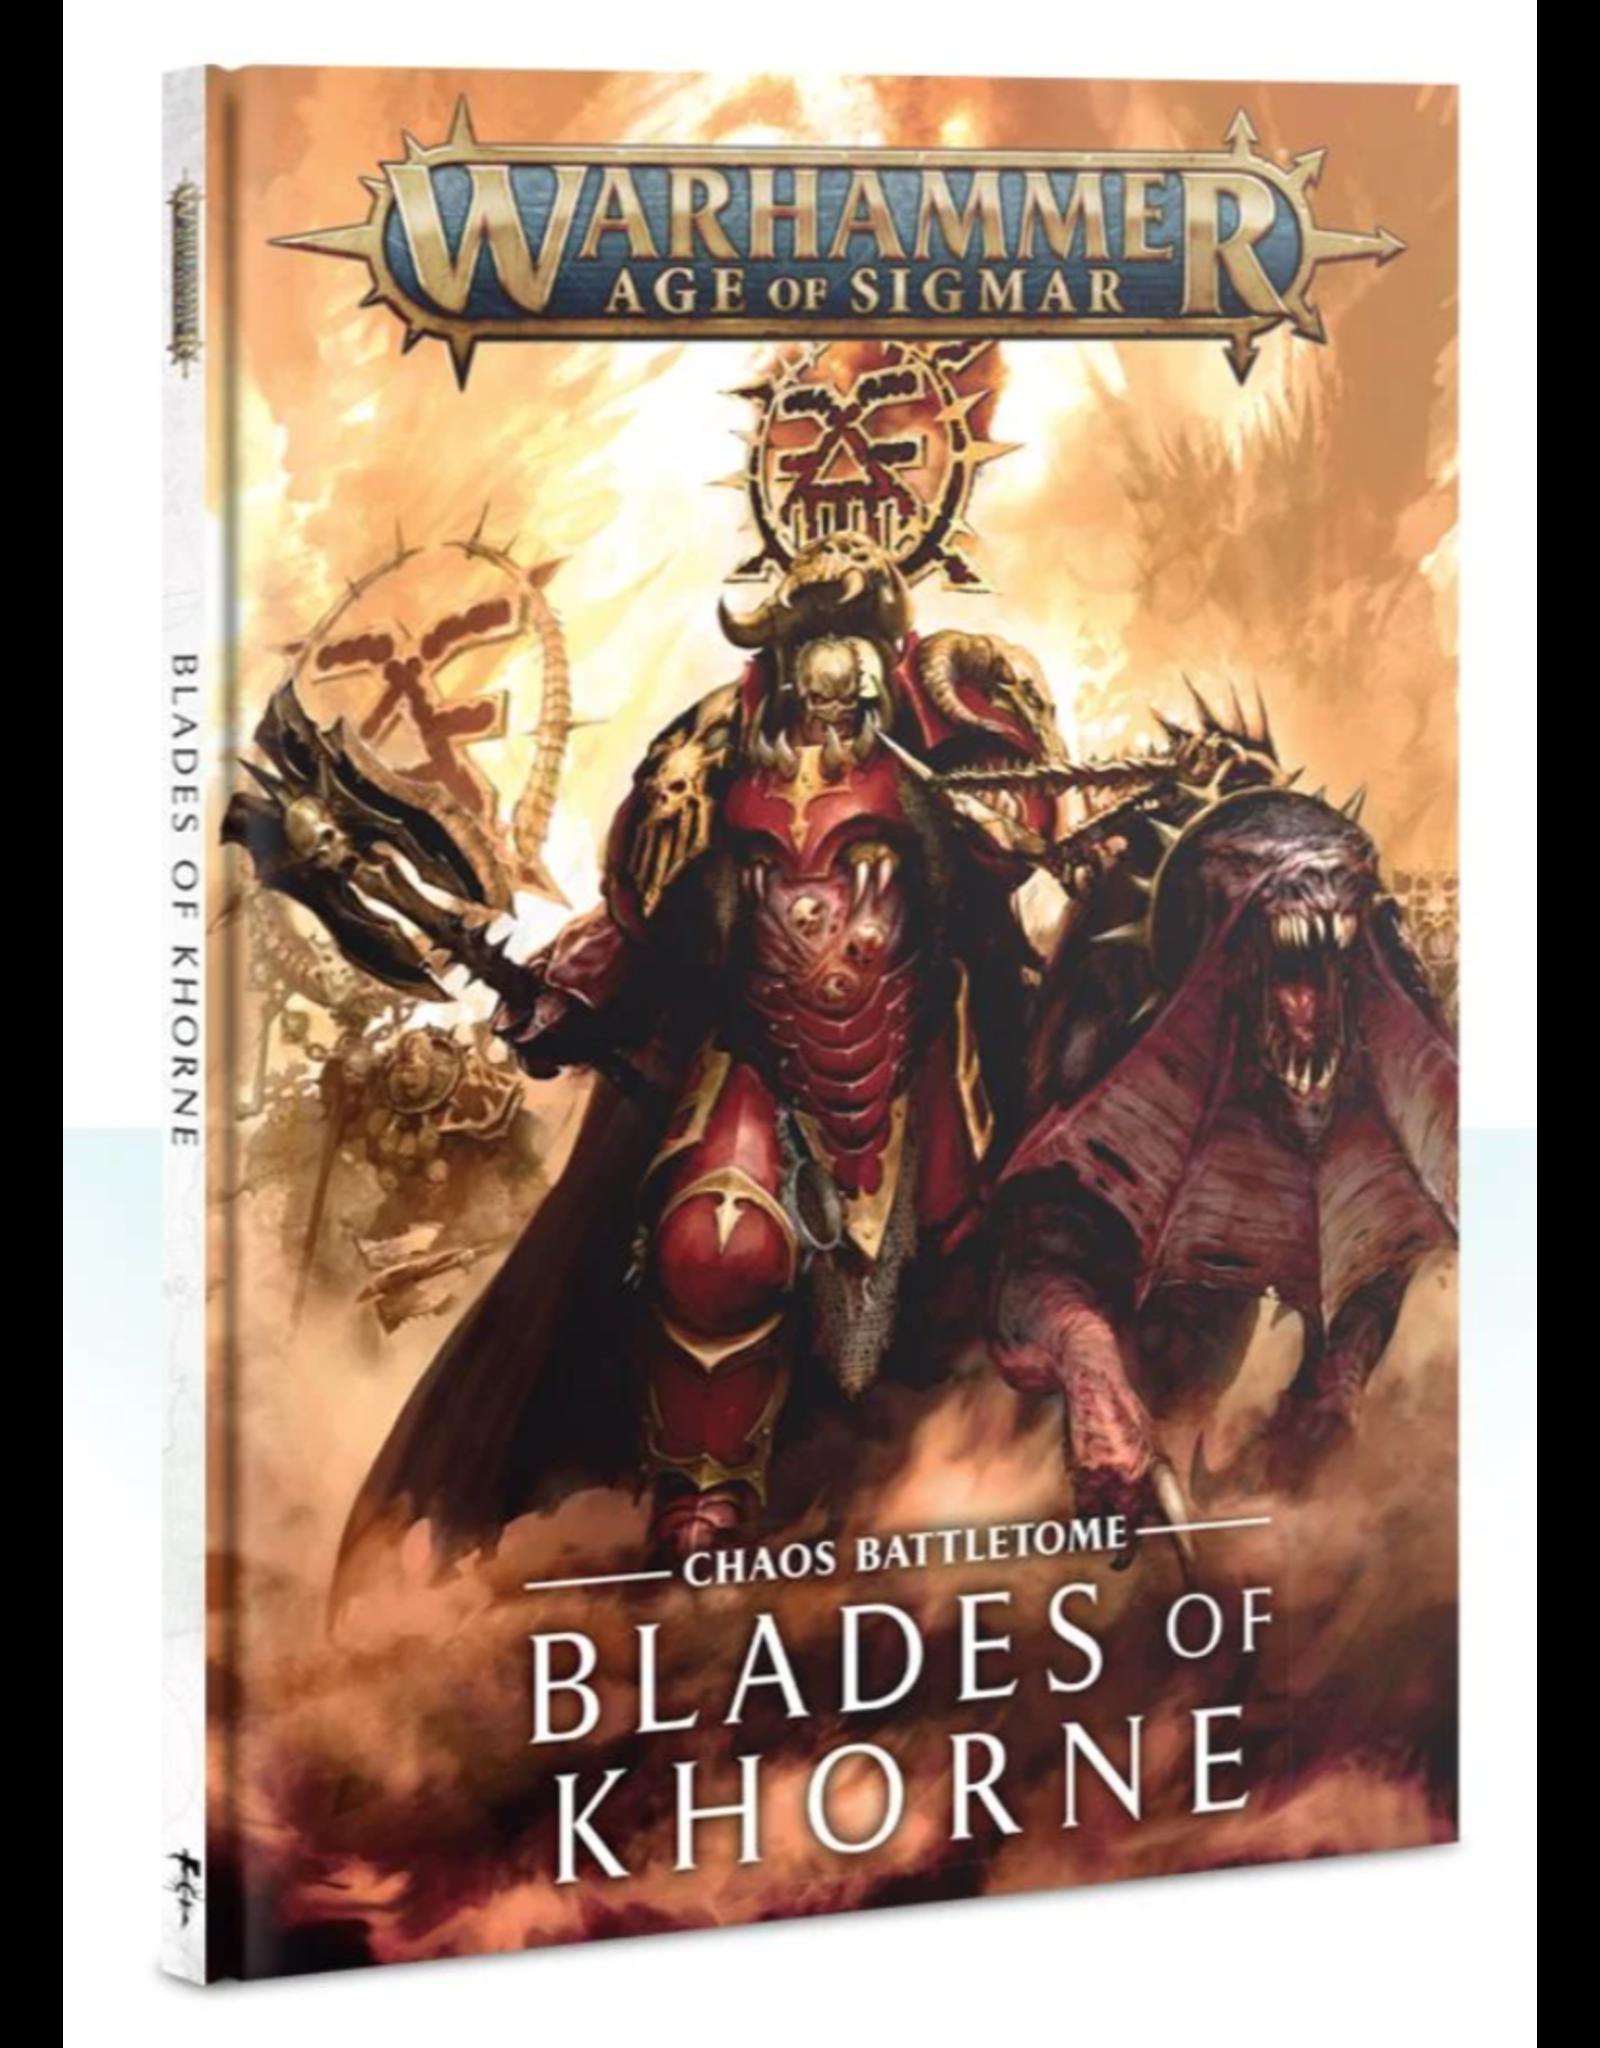 Age of Sigmar Chaos Battletome - Blades of Khorne